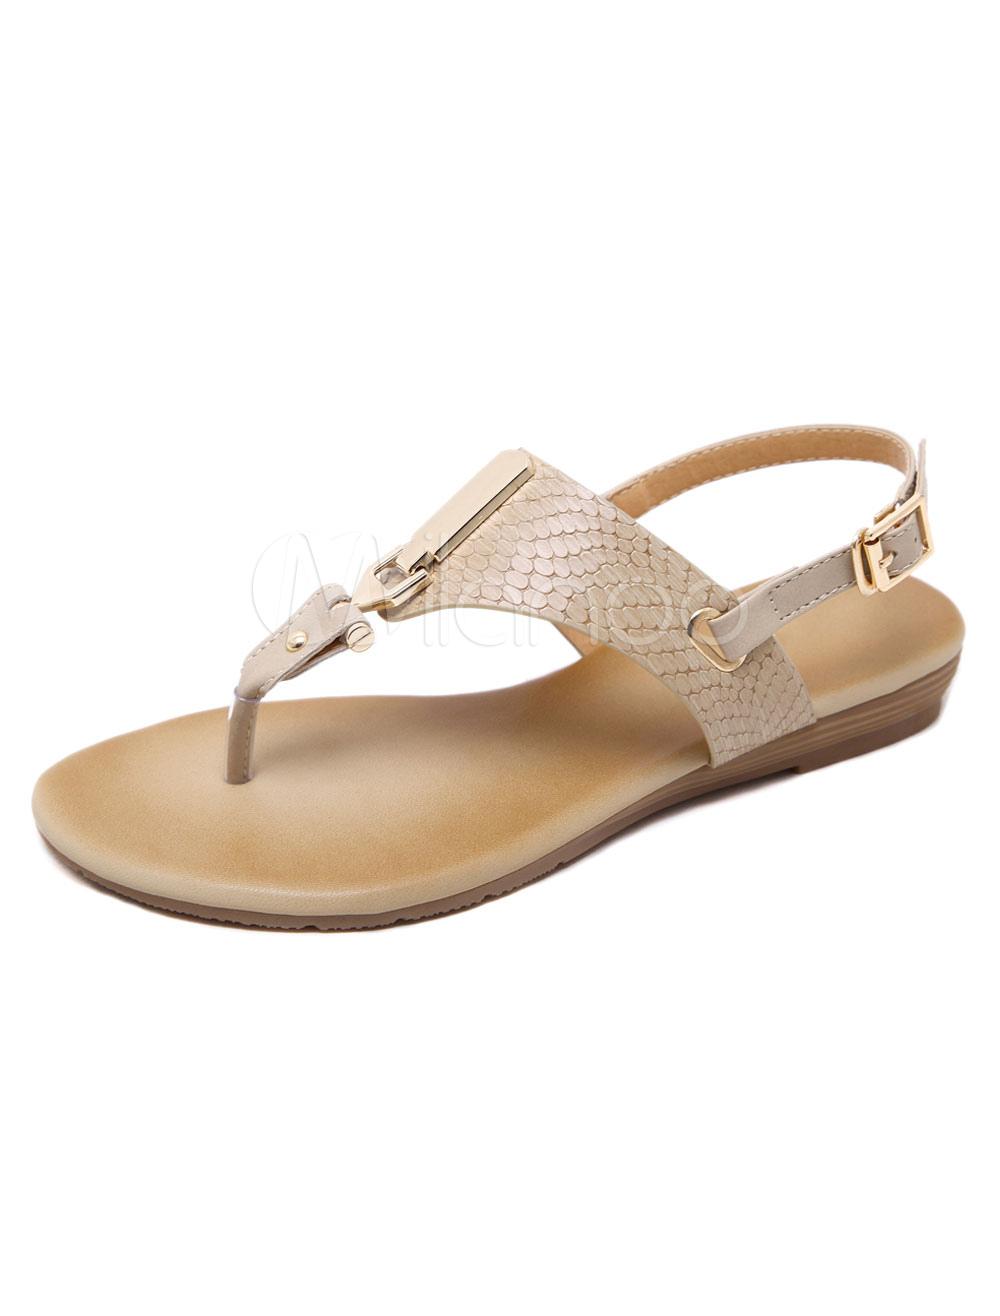 Buy Flip Flop Sandals Women Flat Sandals Thong Metal Detail Slingbacks Sandal Shoes for $23.74 in Milanoo store